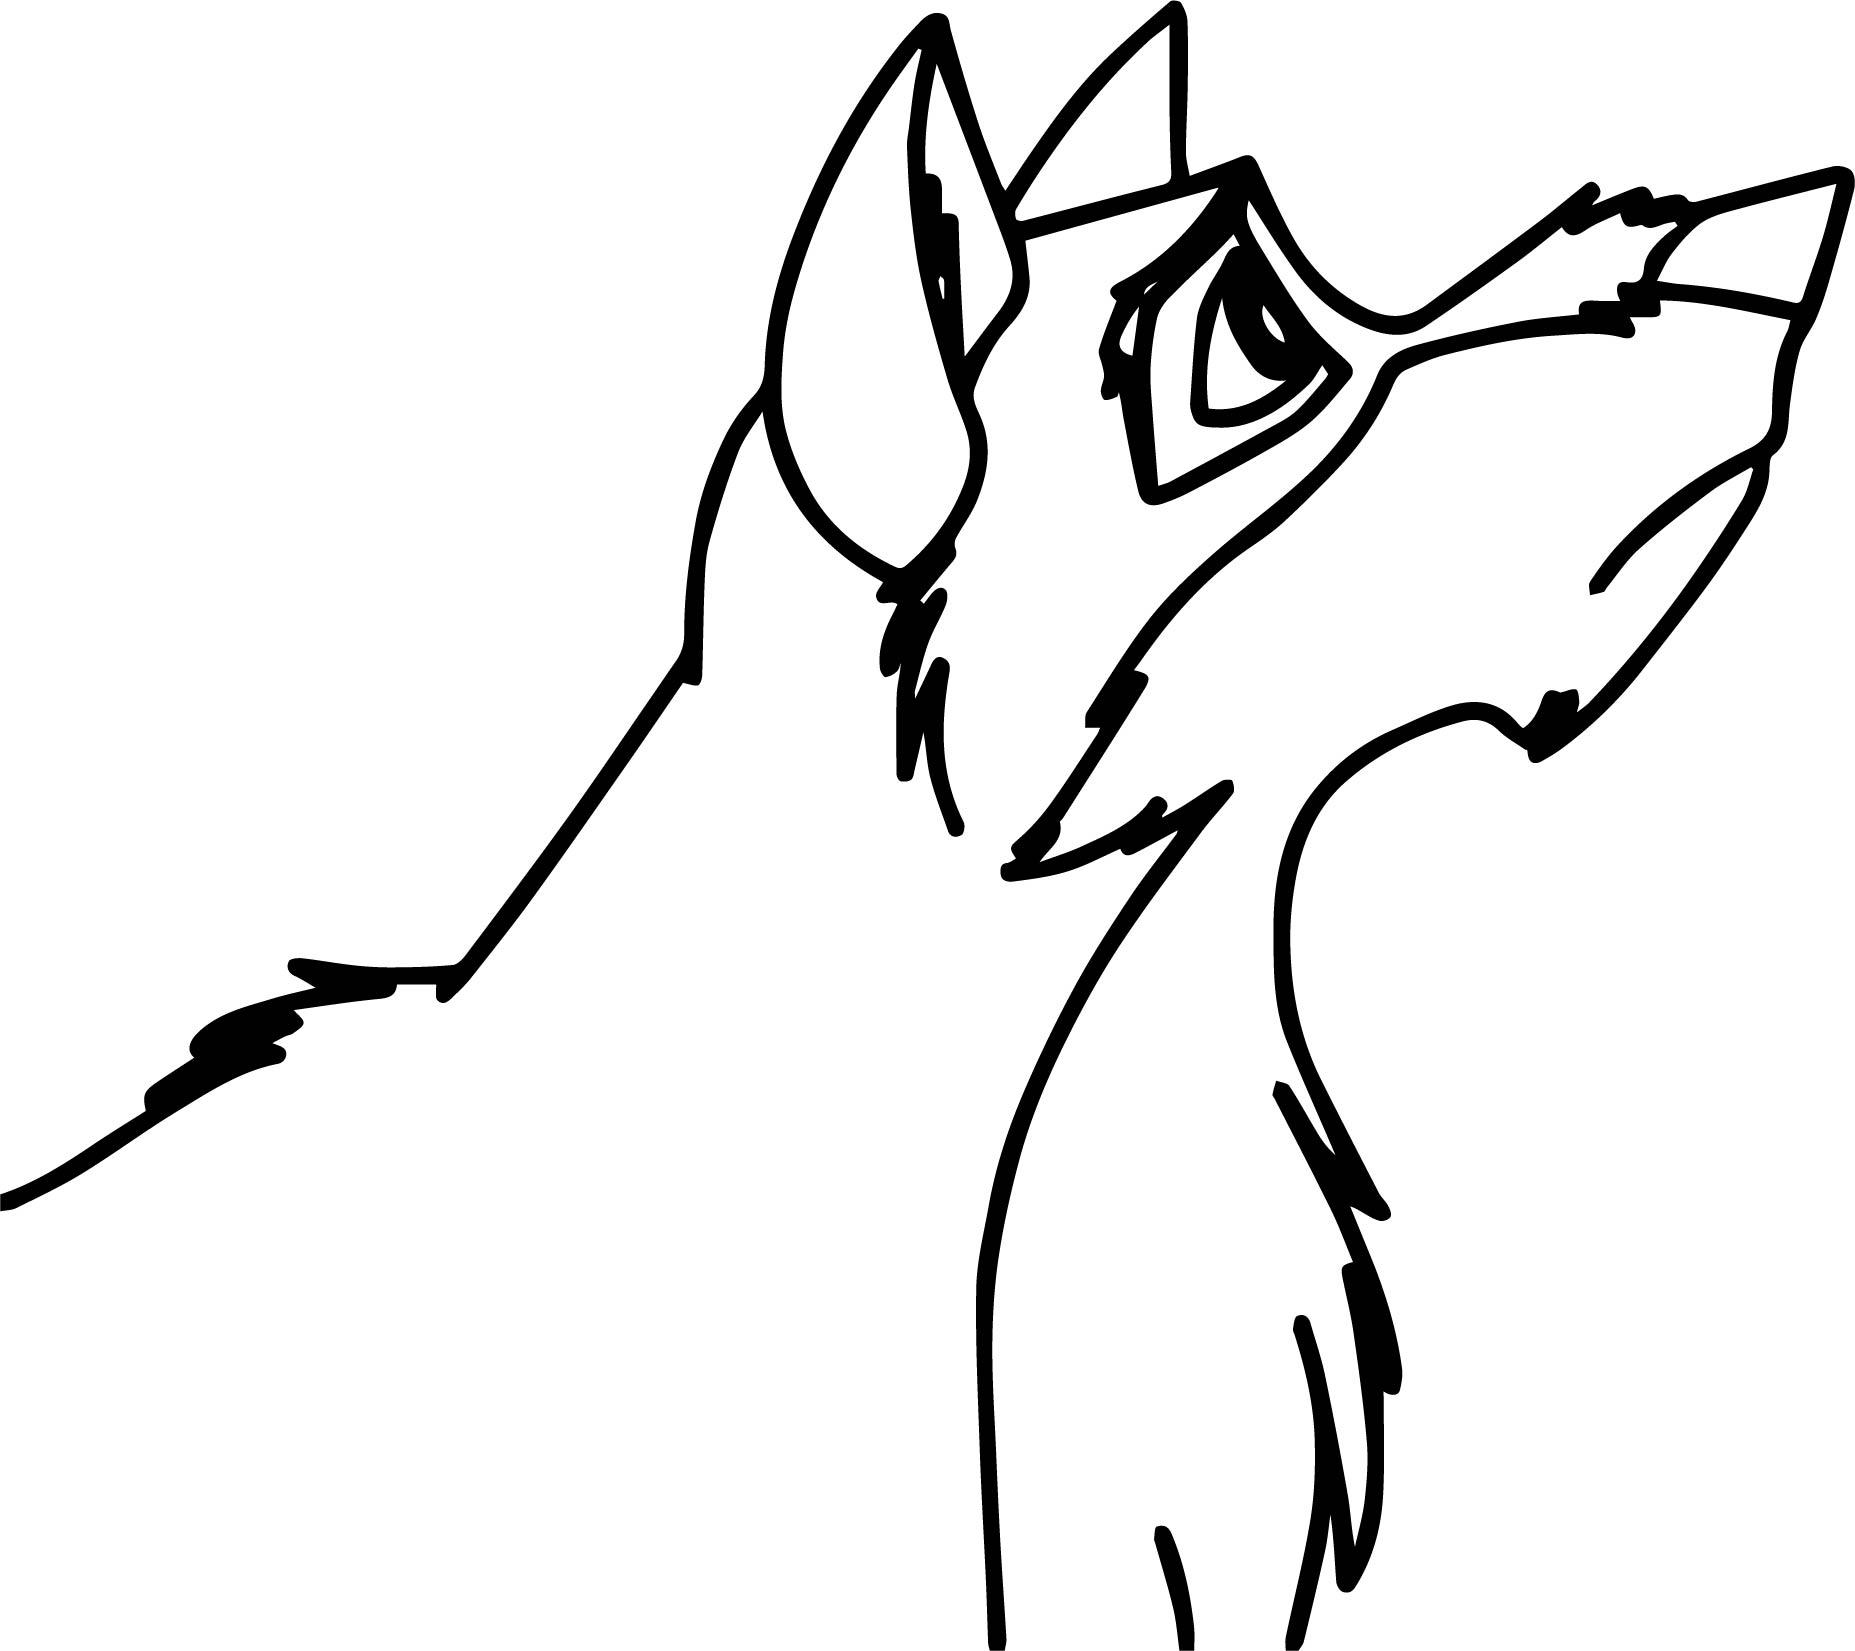 Balto Para Colorear Side Wolf Coloring Page | Wecoloringpage.com